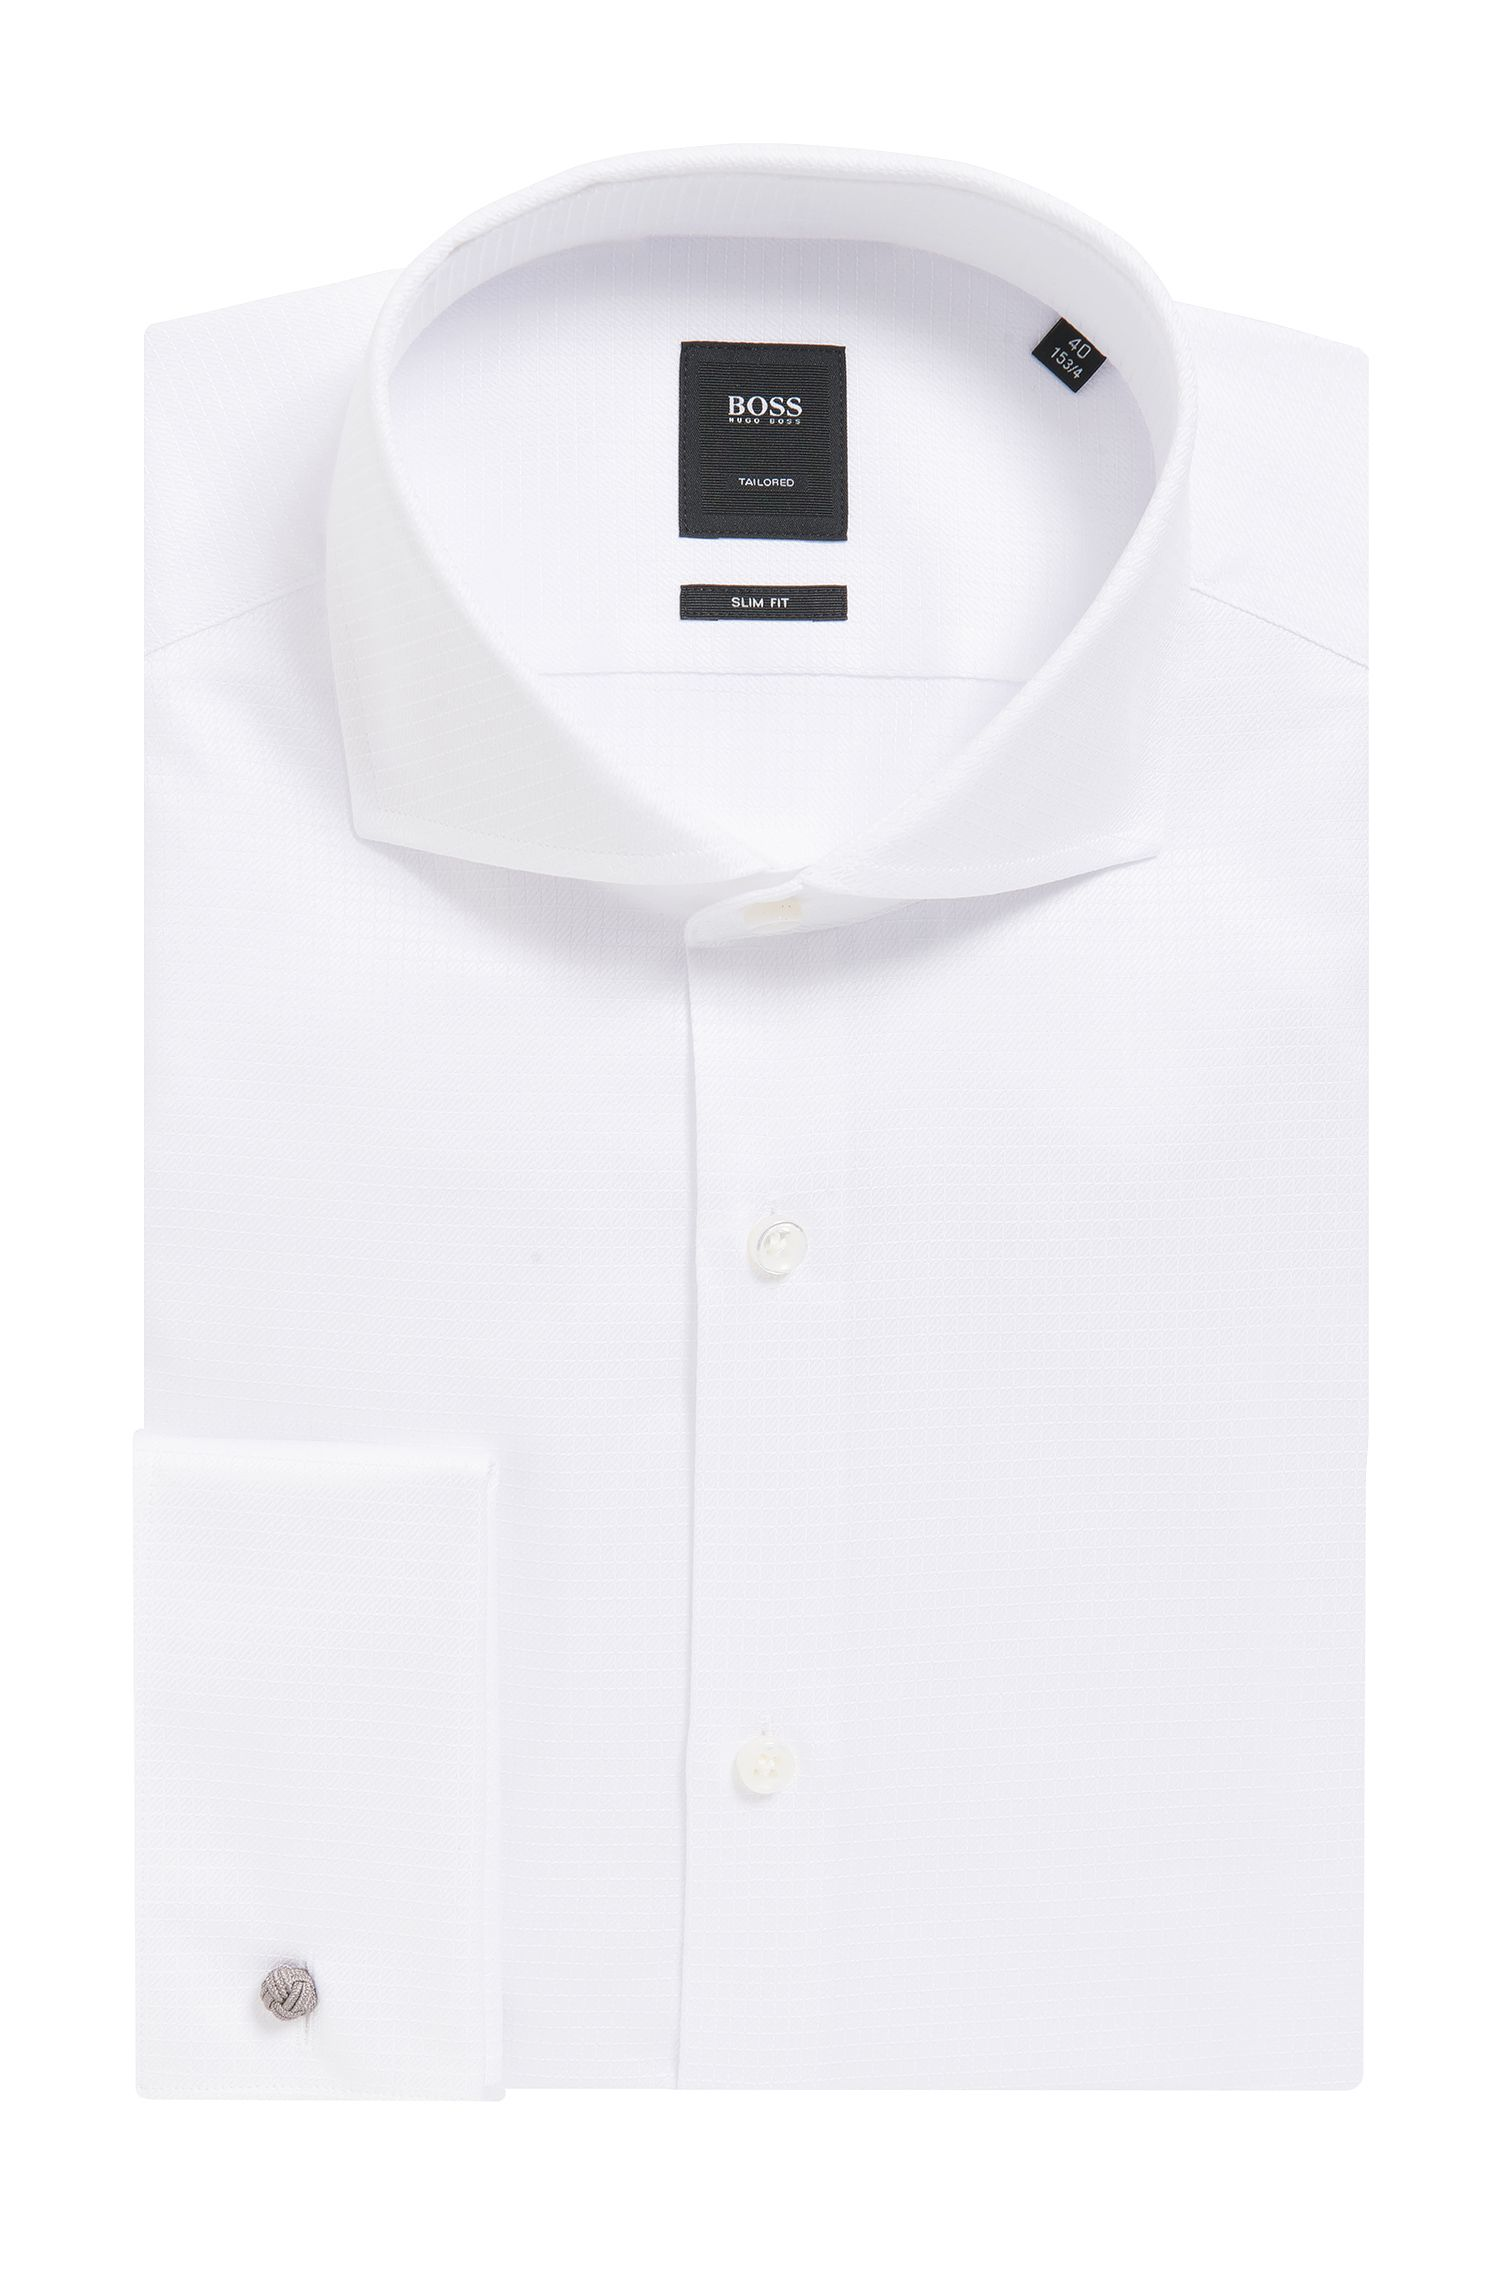 Tonal Check Cotton Dress Shirt, Slim Fit | T-Yacob